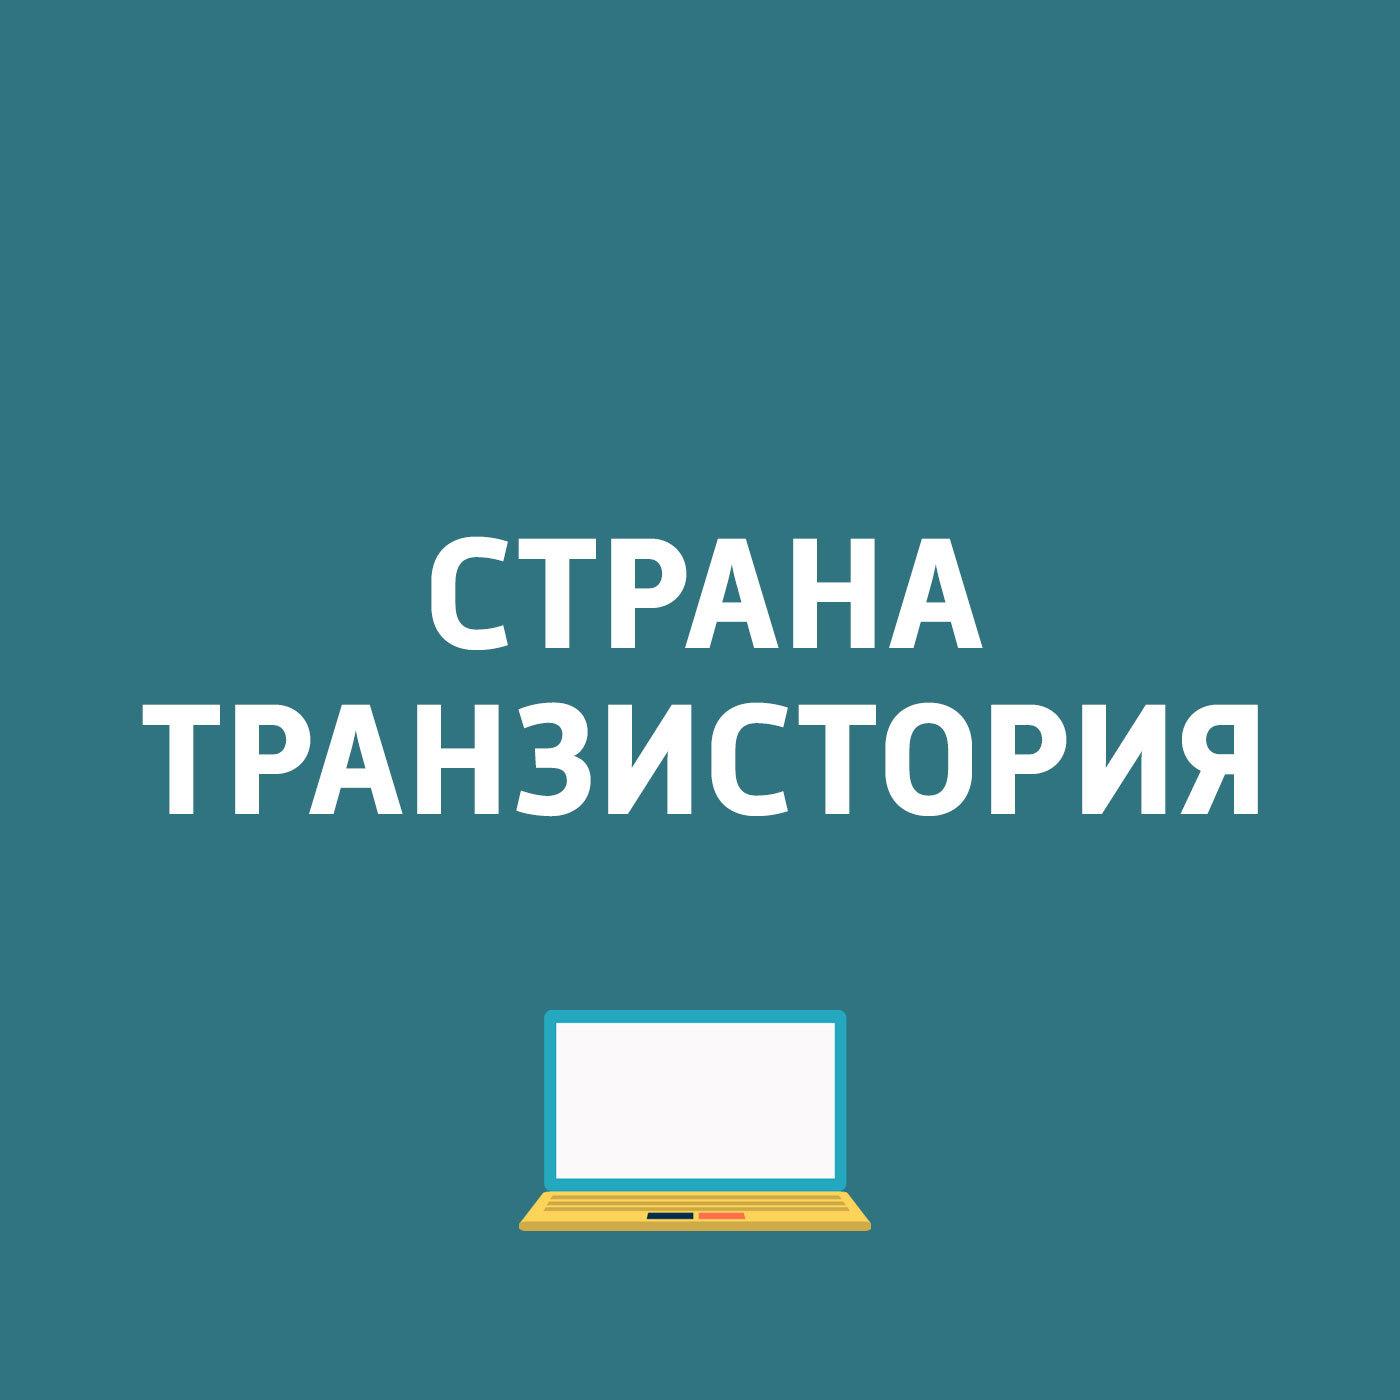 Фото - Картаев Павел Mail.Ru Group объявила о запуске нового мессенджера TamTam mail ru group объявила о запуске нового мессенджера tamtam